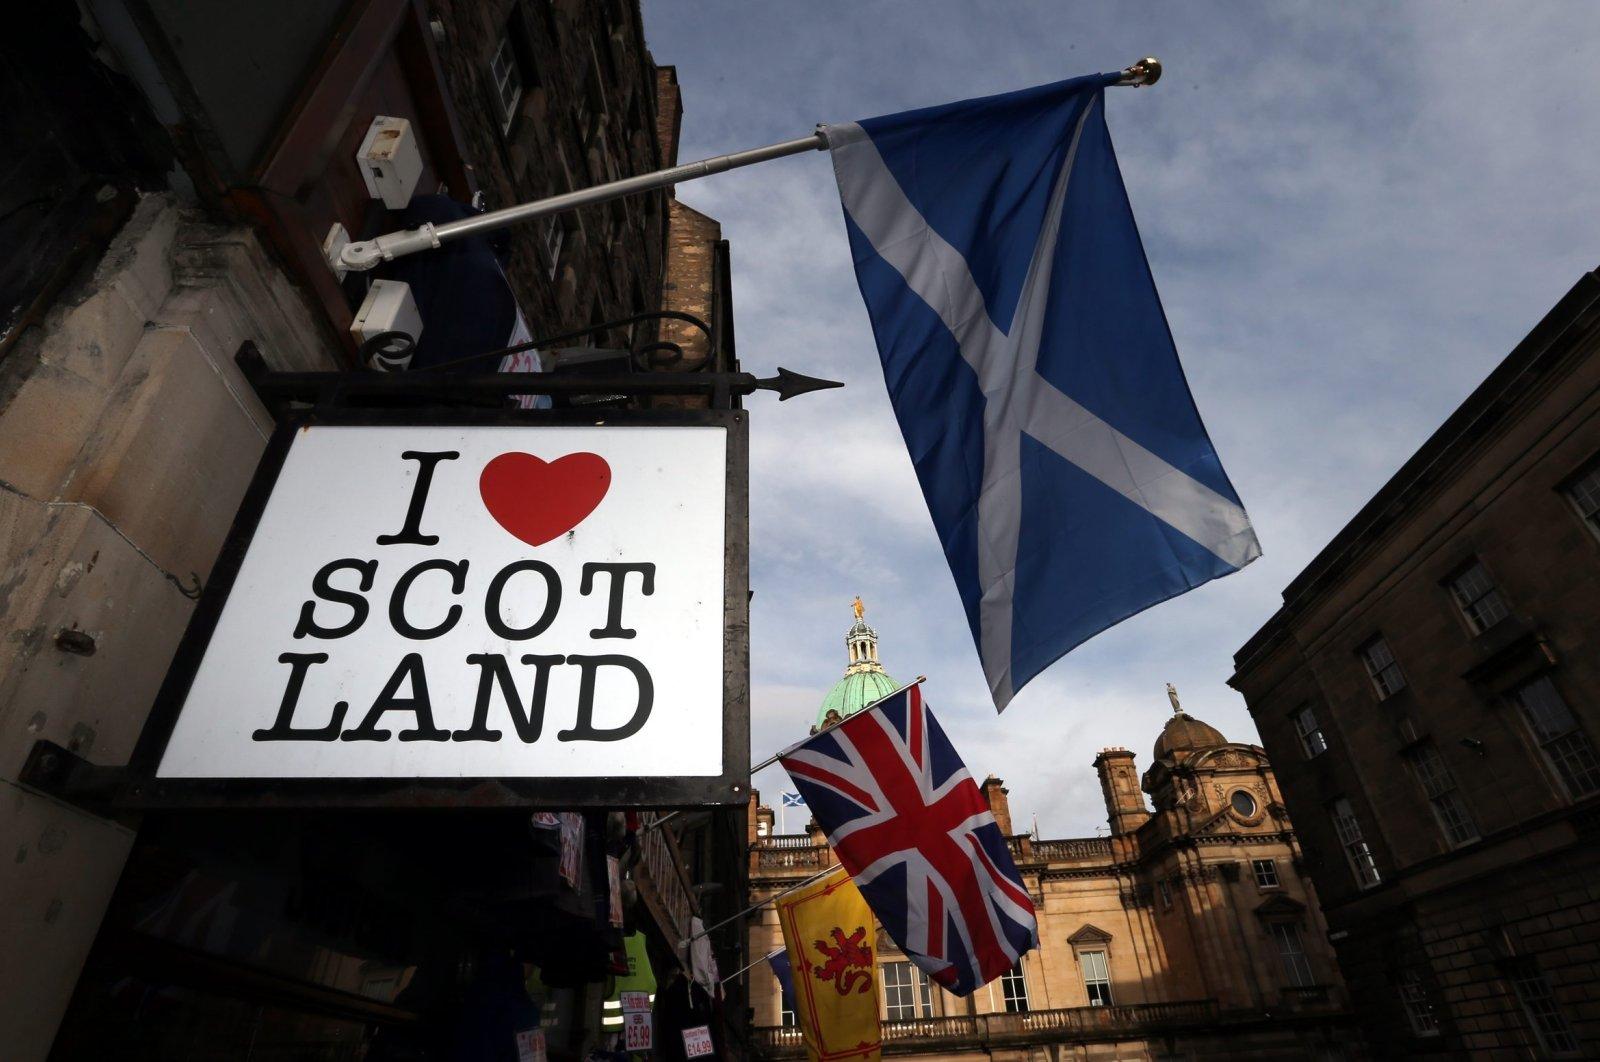 In this Thursday, Feb. 13, 2014, file photo a Scottish flag and a Union flag fly outside a Scottish memorabilia shop in Edinburgh, Scotland. (AP Photo)